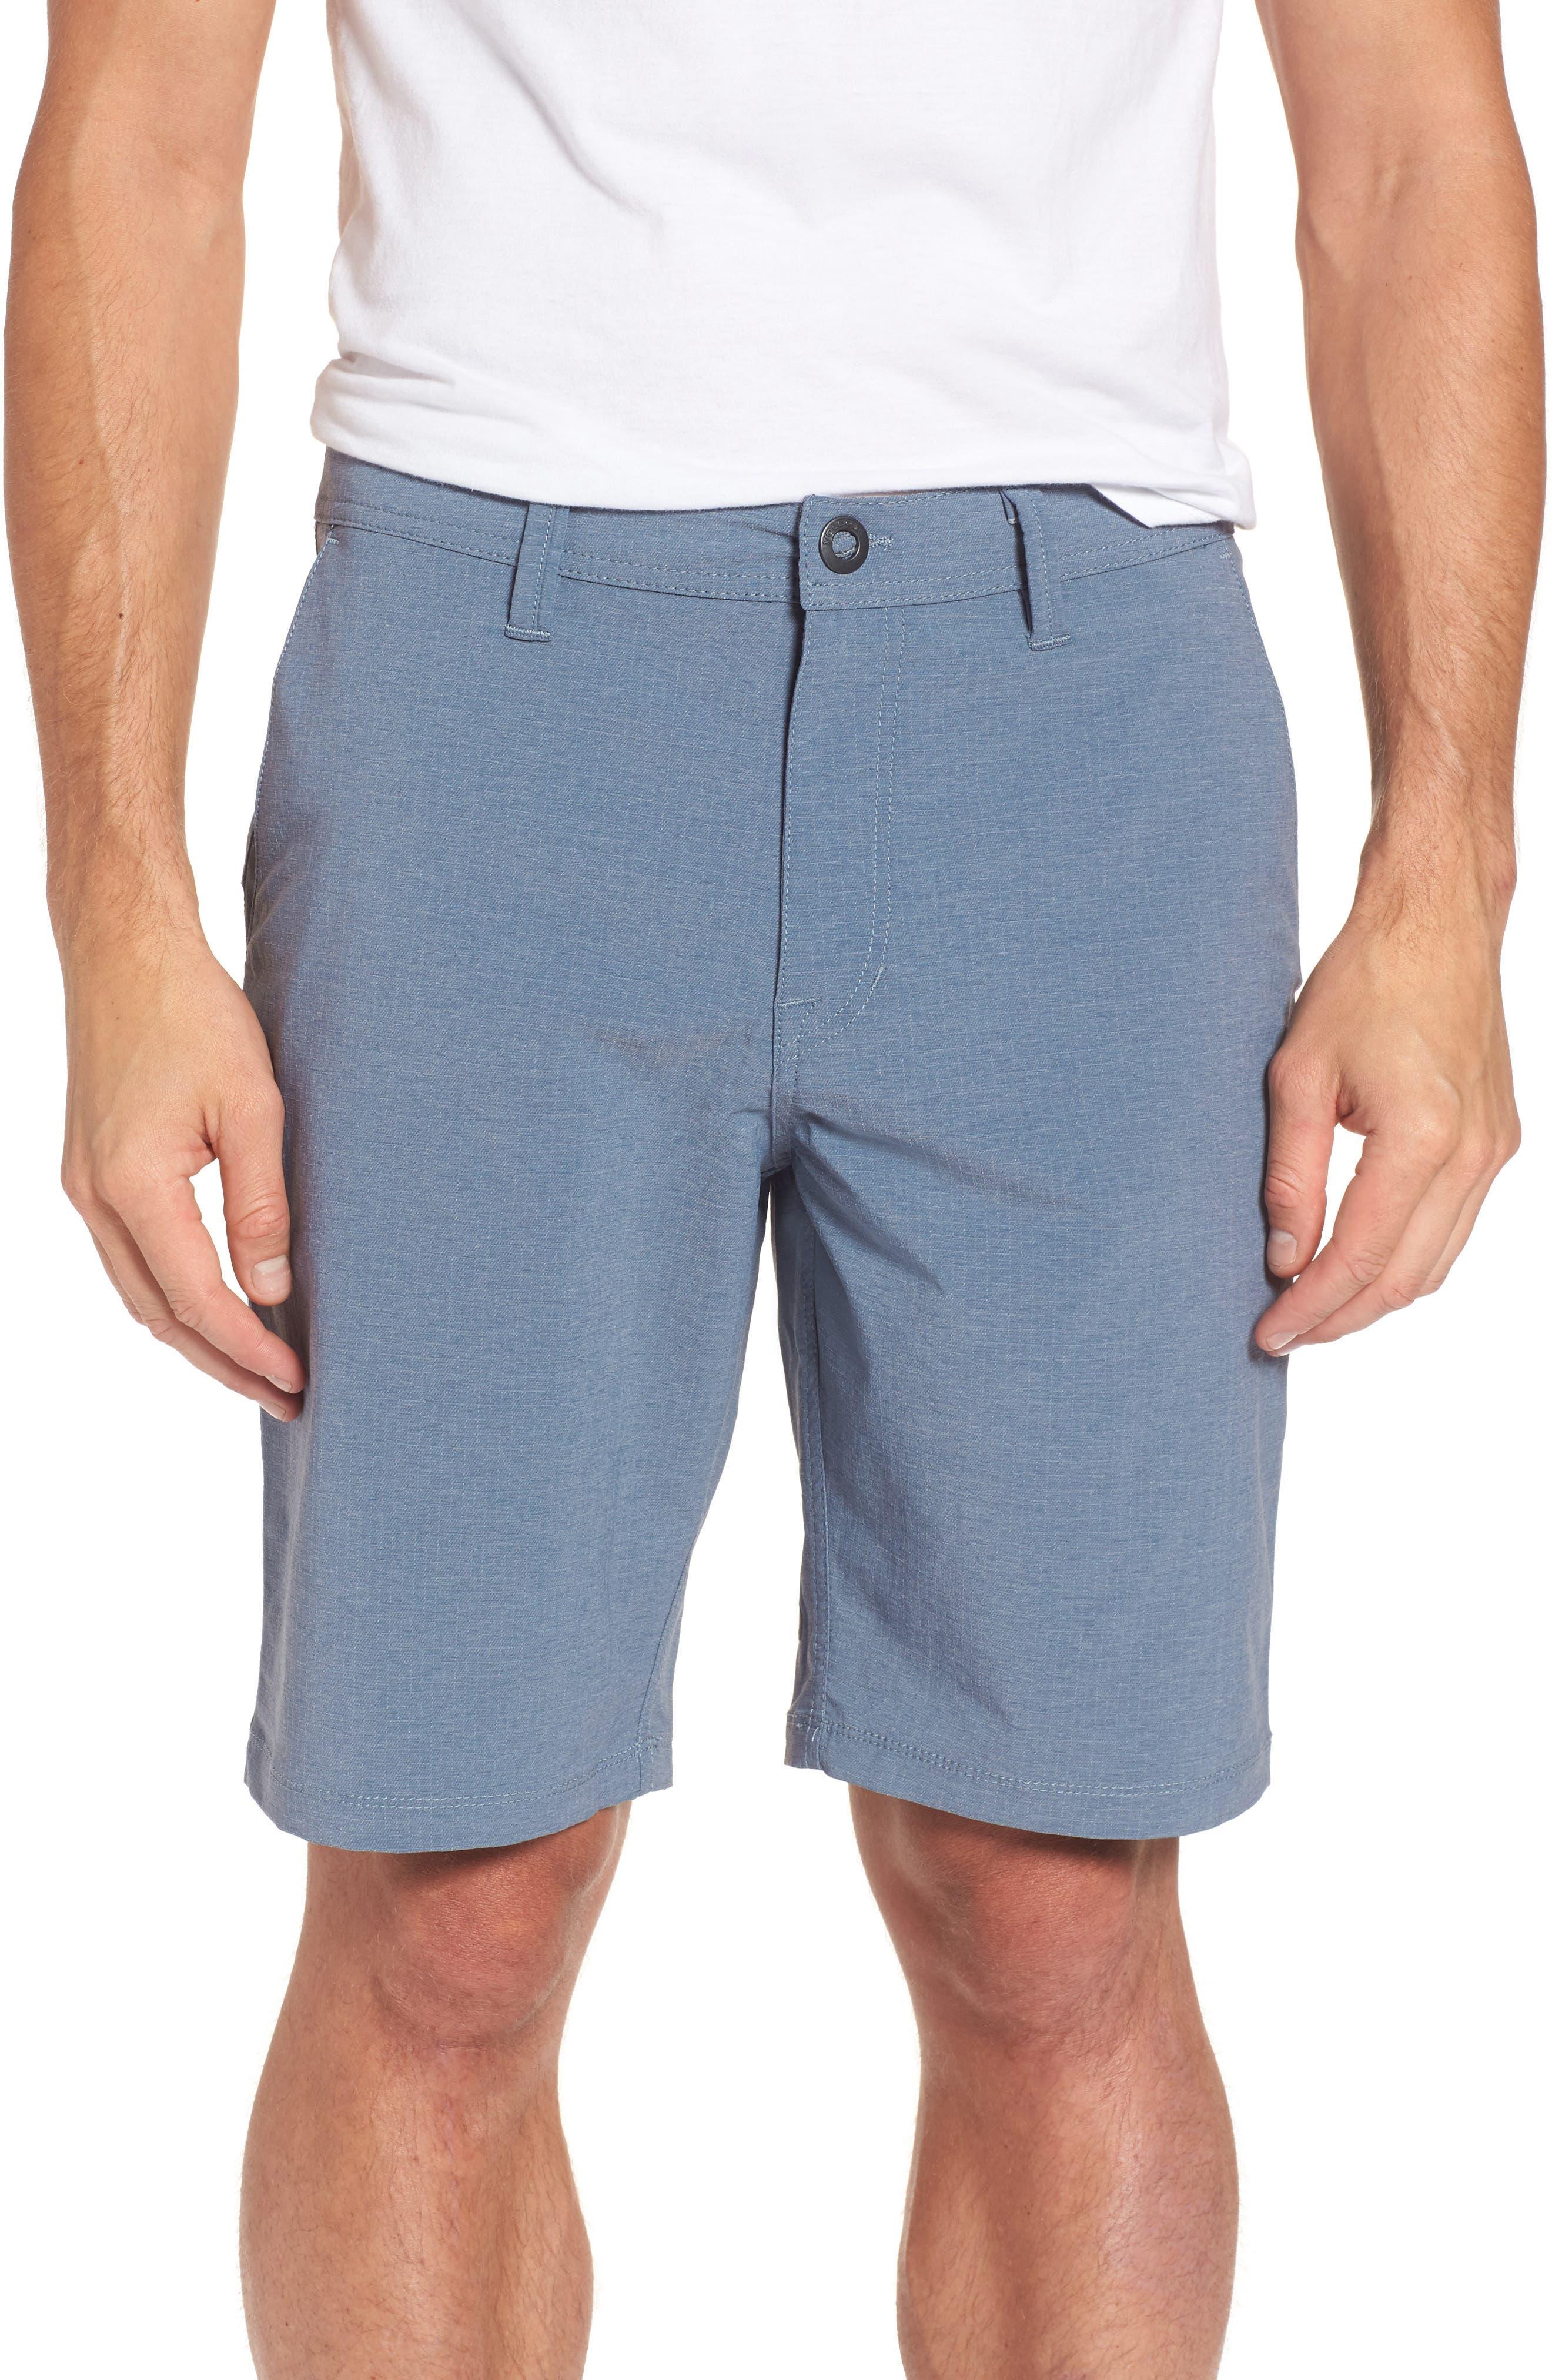 Alternate Image 1 Selected - Volcom Surf 'N Turf Shorts